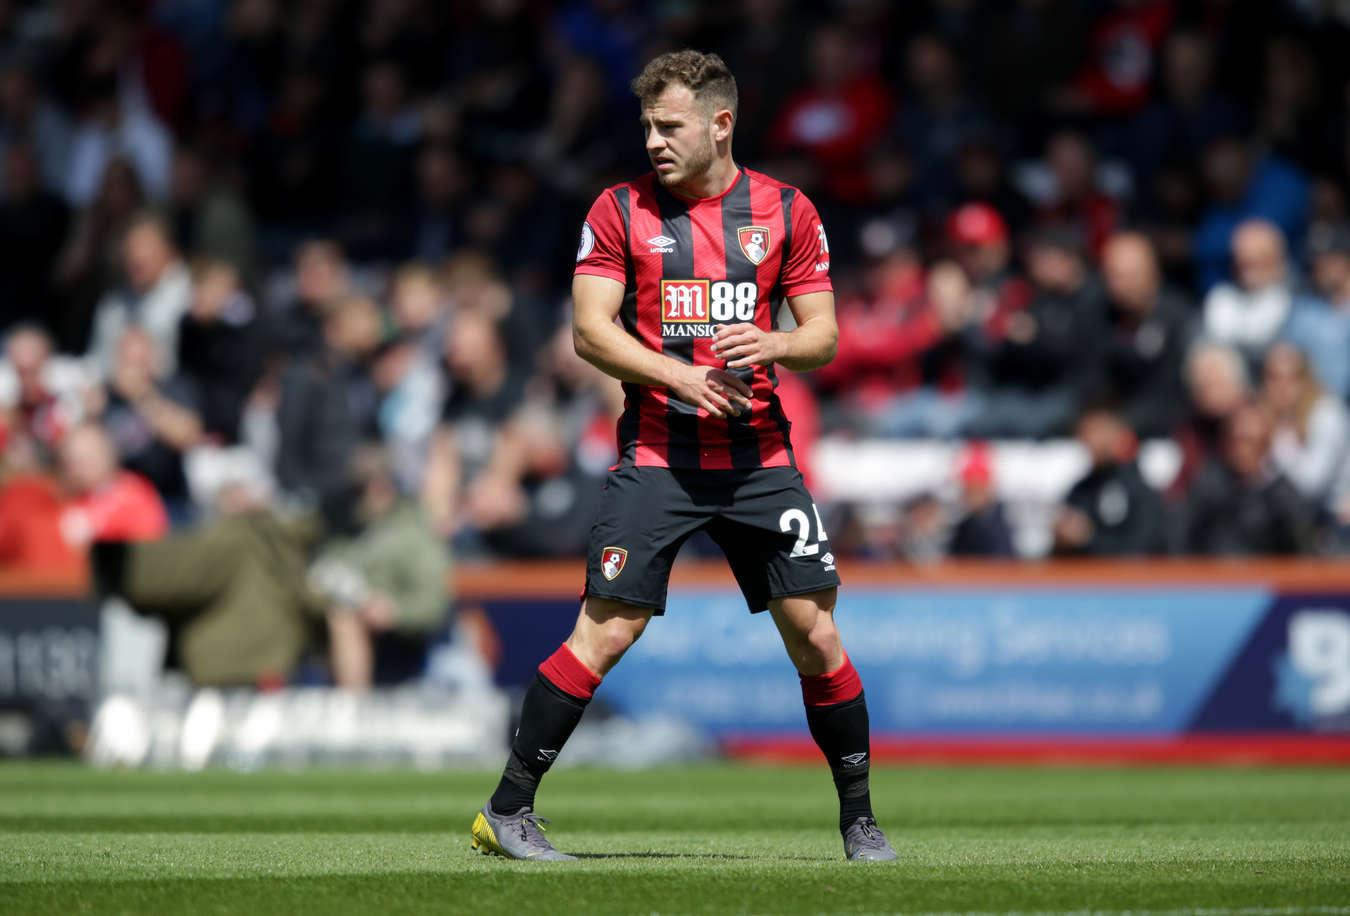 Arsenal keen on signing Bournemouth star Ryan Fraser on free transfer   Read more: https://metro.co.uk/2020/03/25/arsenal-keen-signing-bournemouth-star-ryan-fraser-free-transfer-12456924/?ito=cbshare  Twitter: https://twitter.com/MetroUK | Facebook: https://www.facebook.com/MetroUK/ - Bóng Đá